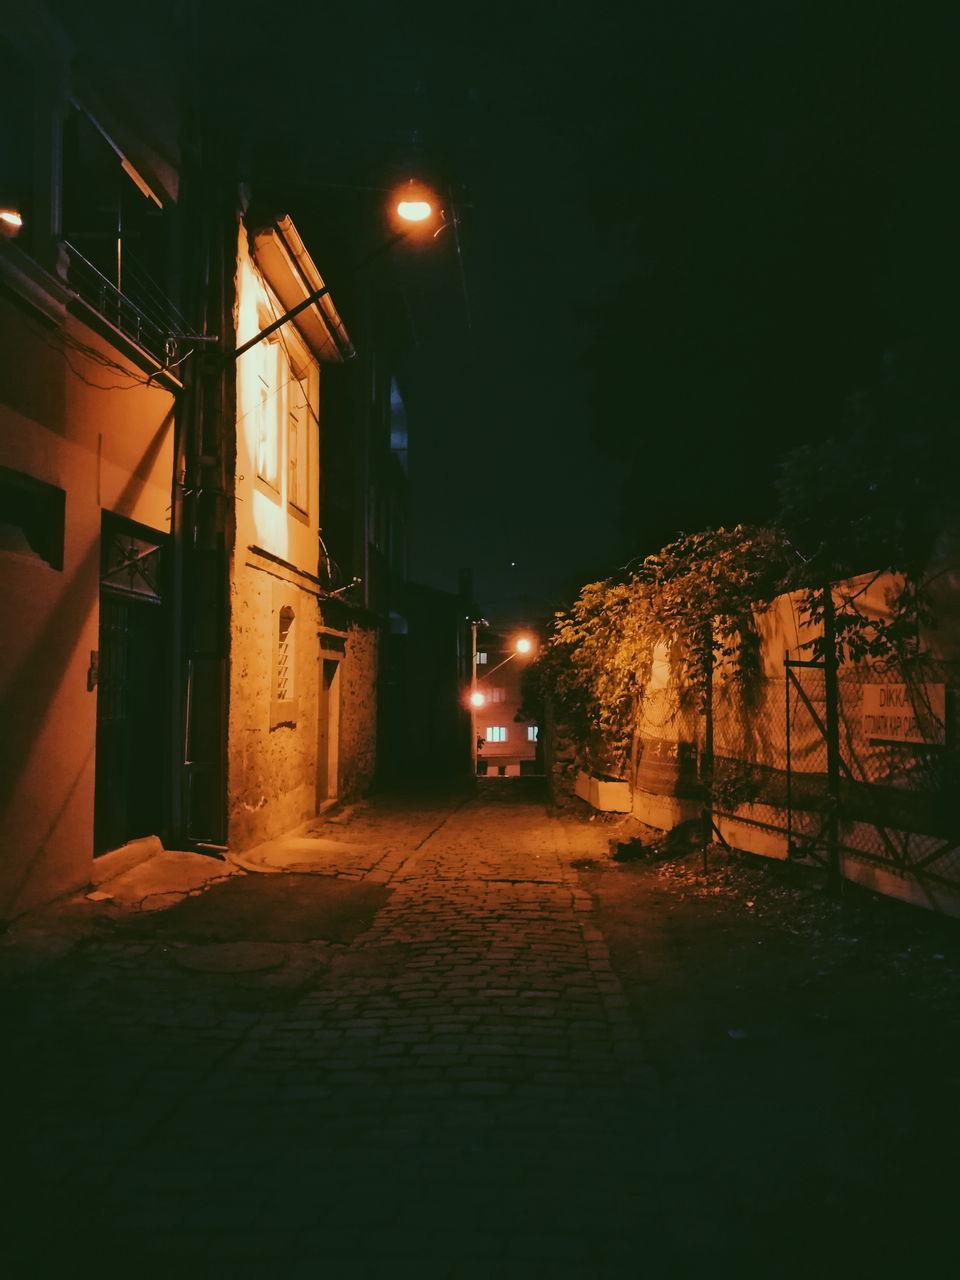 ILLUMINATED STREET LIGHTS BY BUILDINGS AT NIGHT